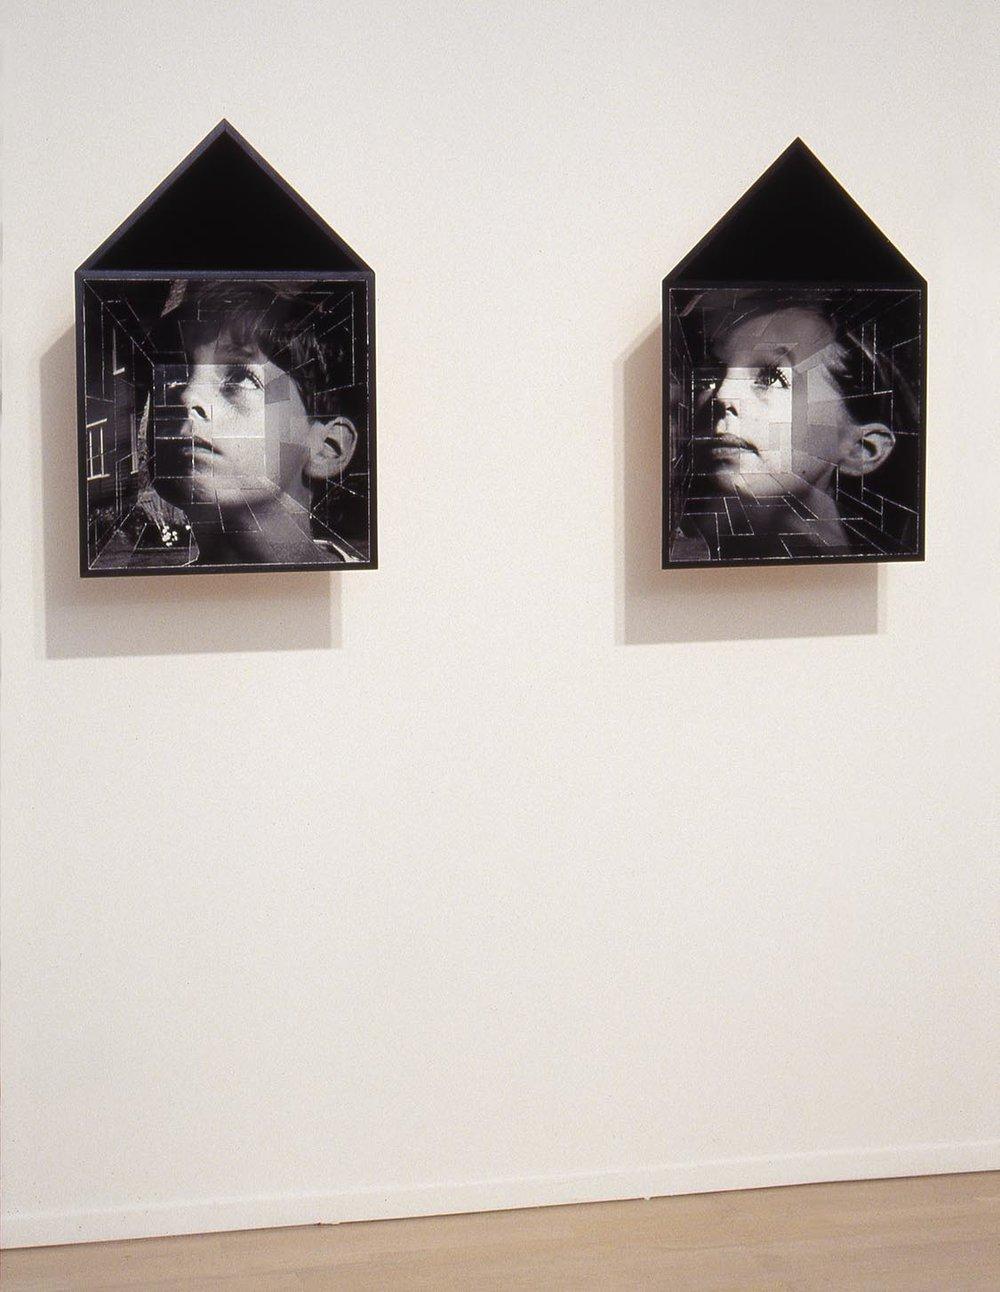 Thierry et Mayalène (Thierry And Mayalène), 1993